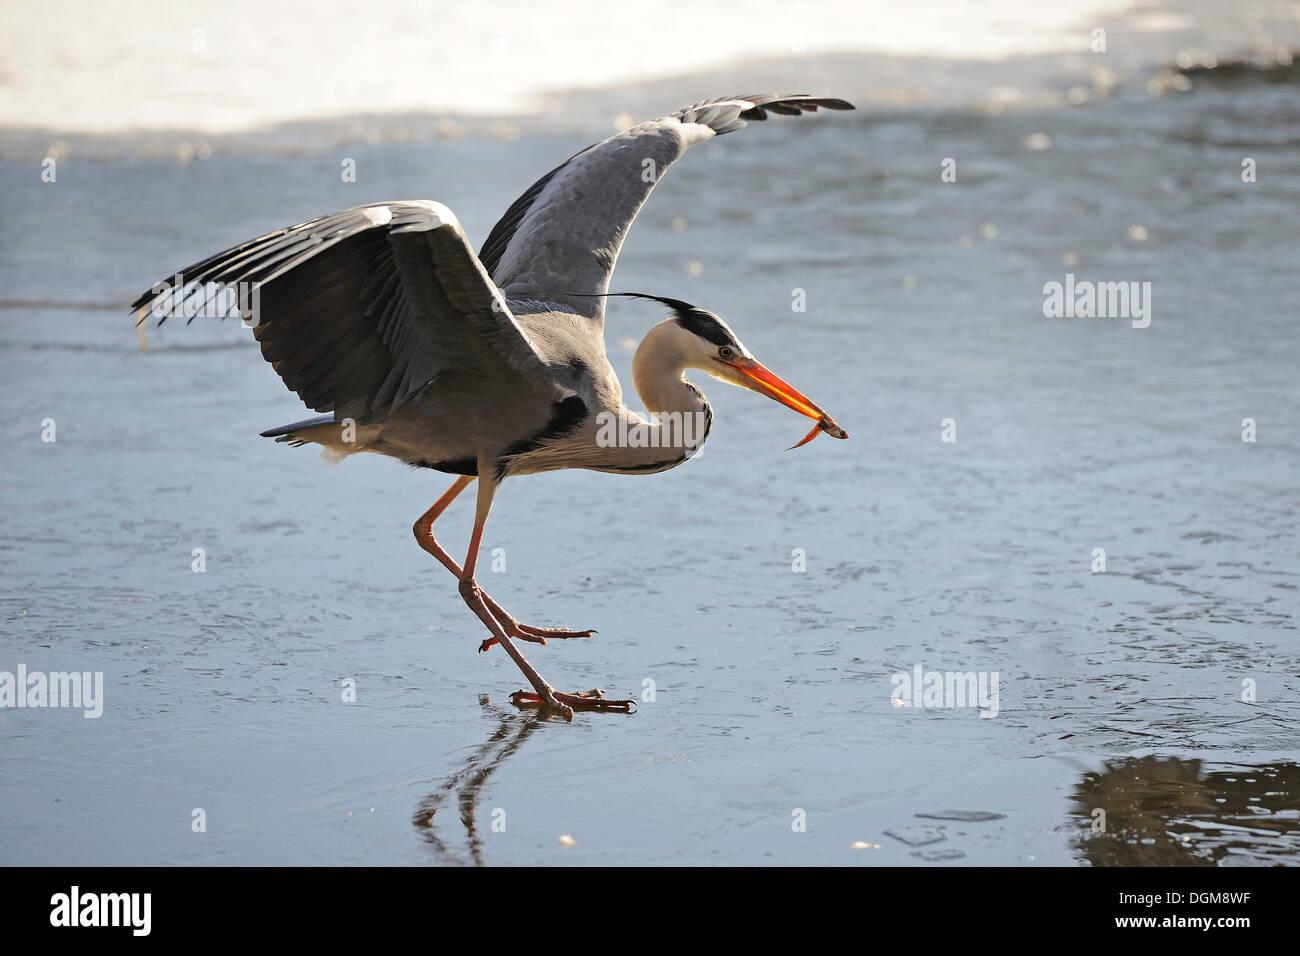 Grey Heron (Ardea cinerea) on thin ice with caught fish - Stock Image